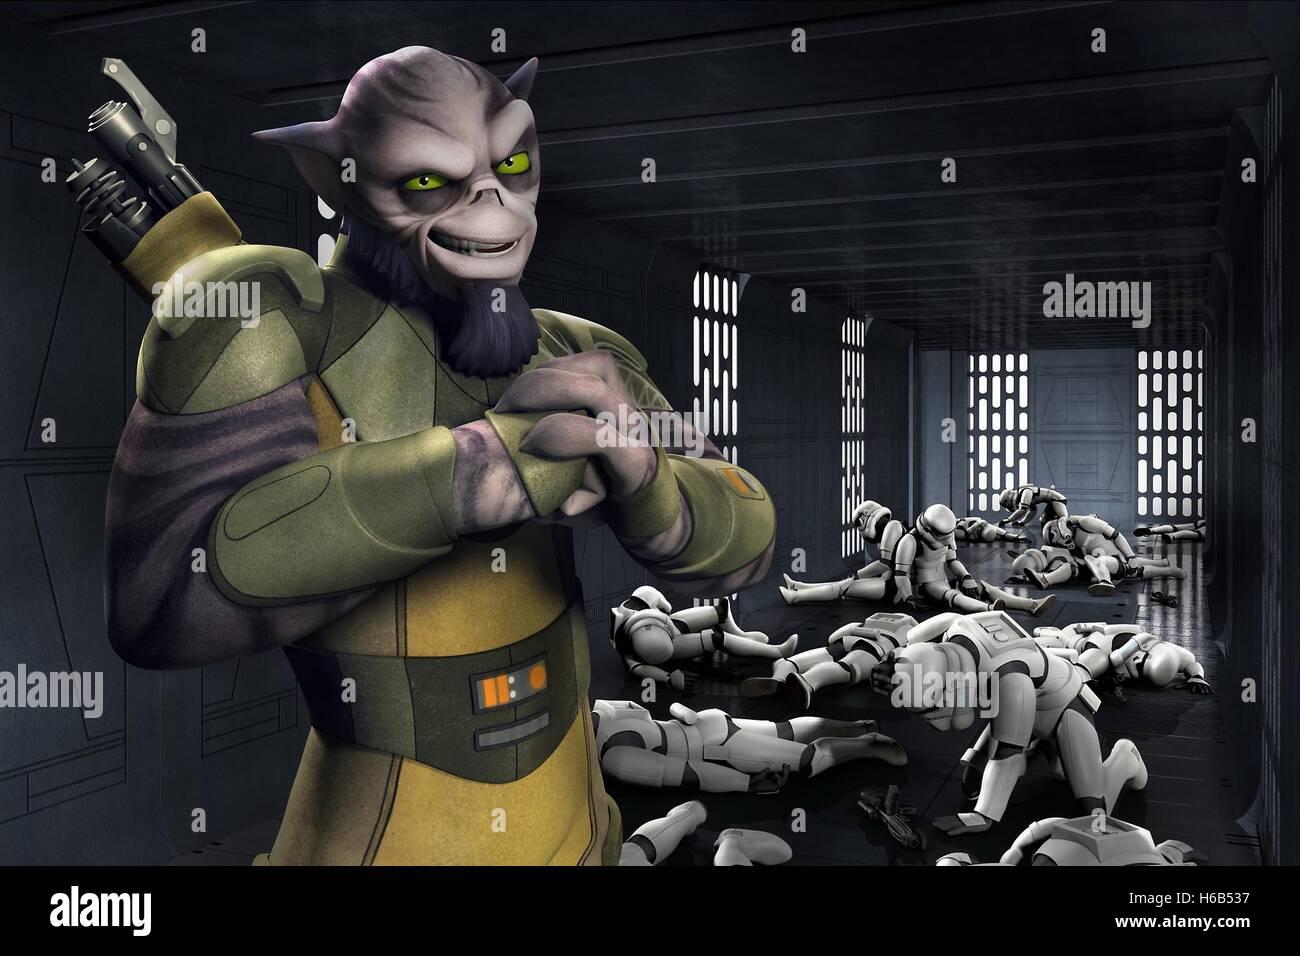 ZEB STAR WARS REBELS (2014) - Stock Image